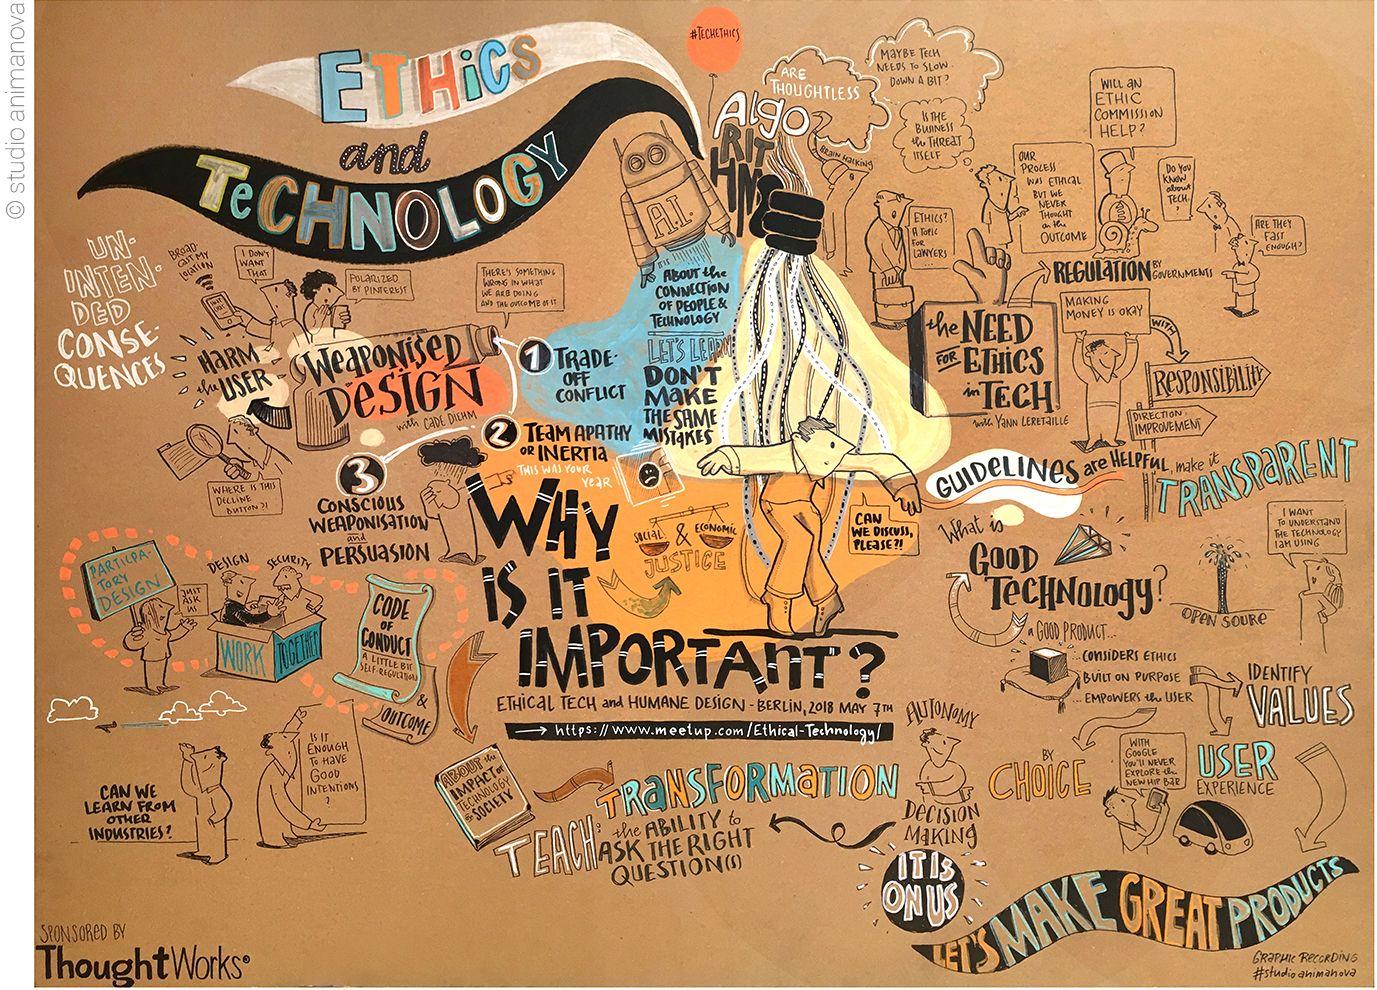 Graphic Recording Ethics & Tech